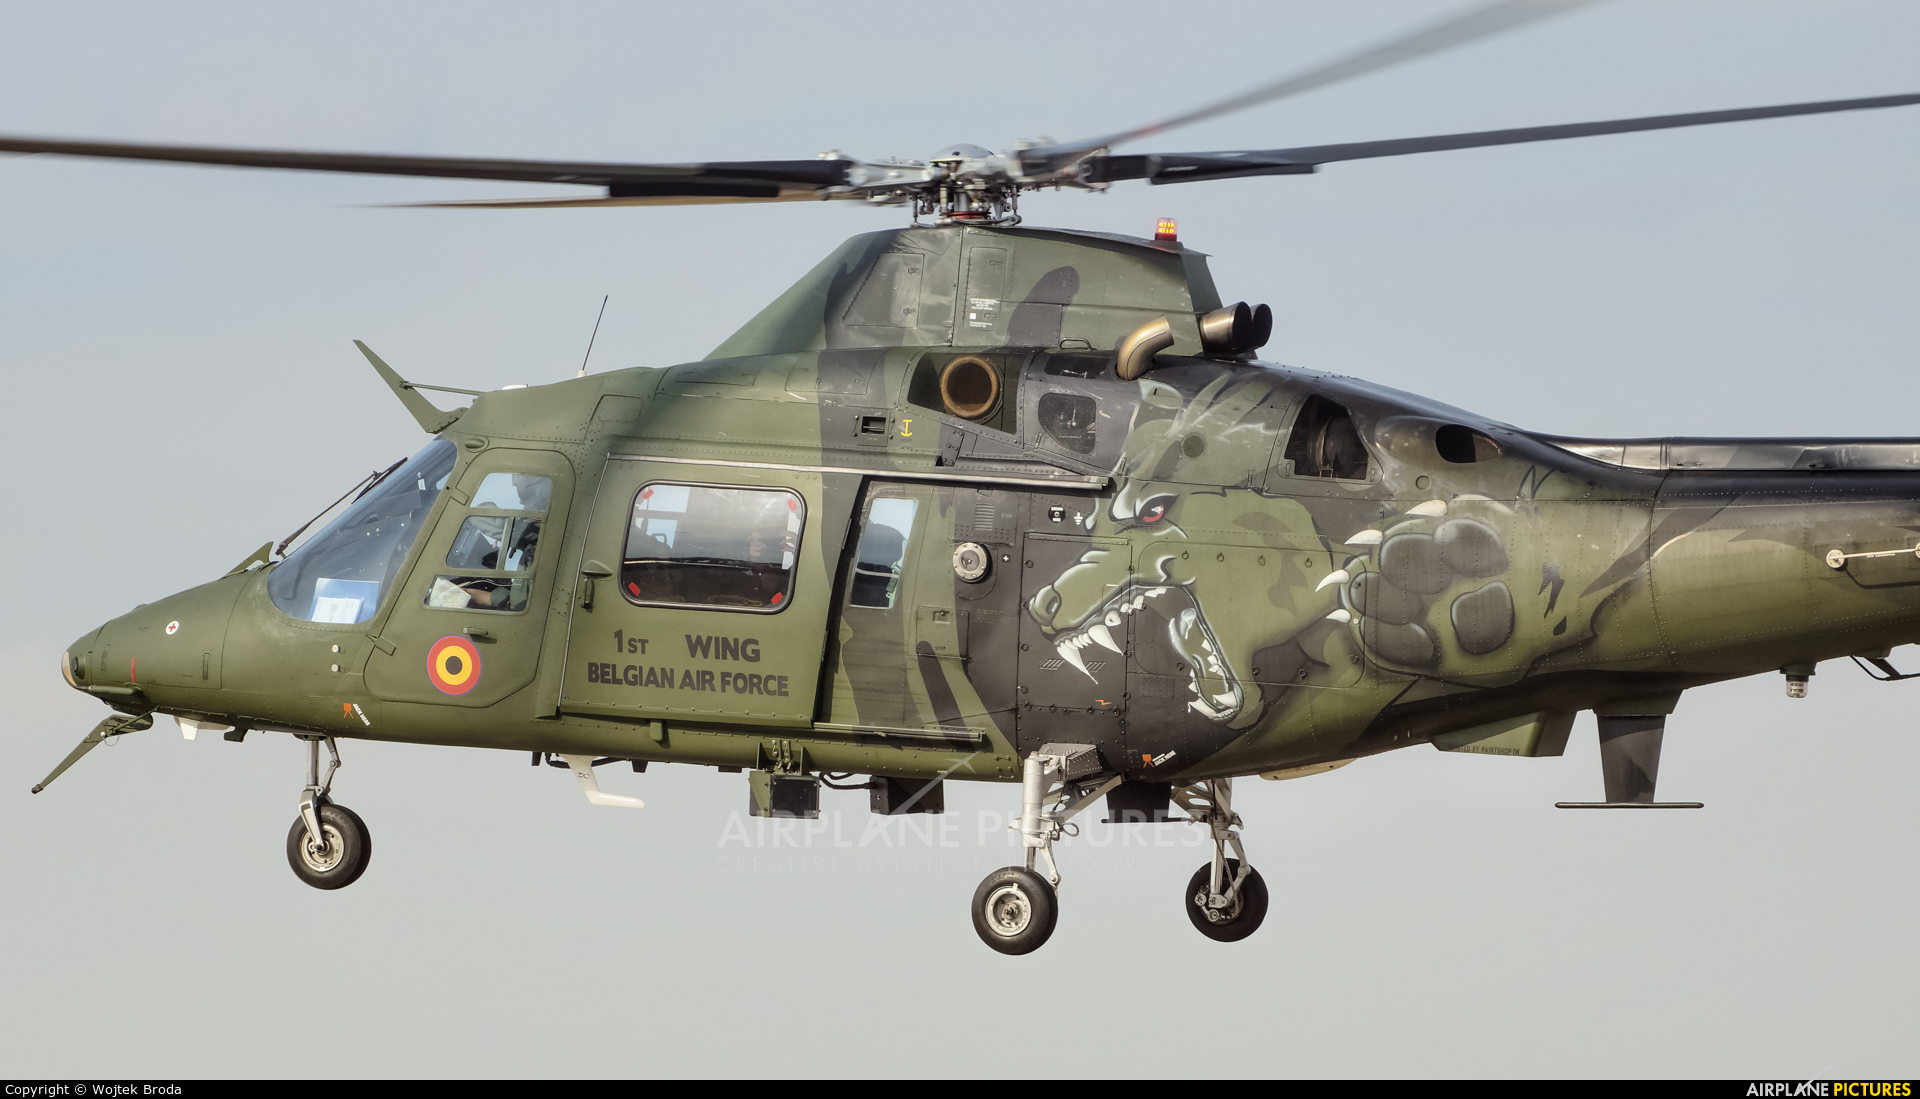 Belgium - Air Force H29 aircraft at Hradec Králové